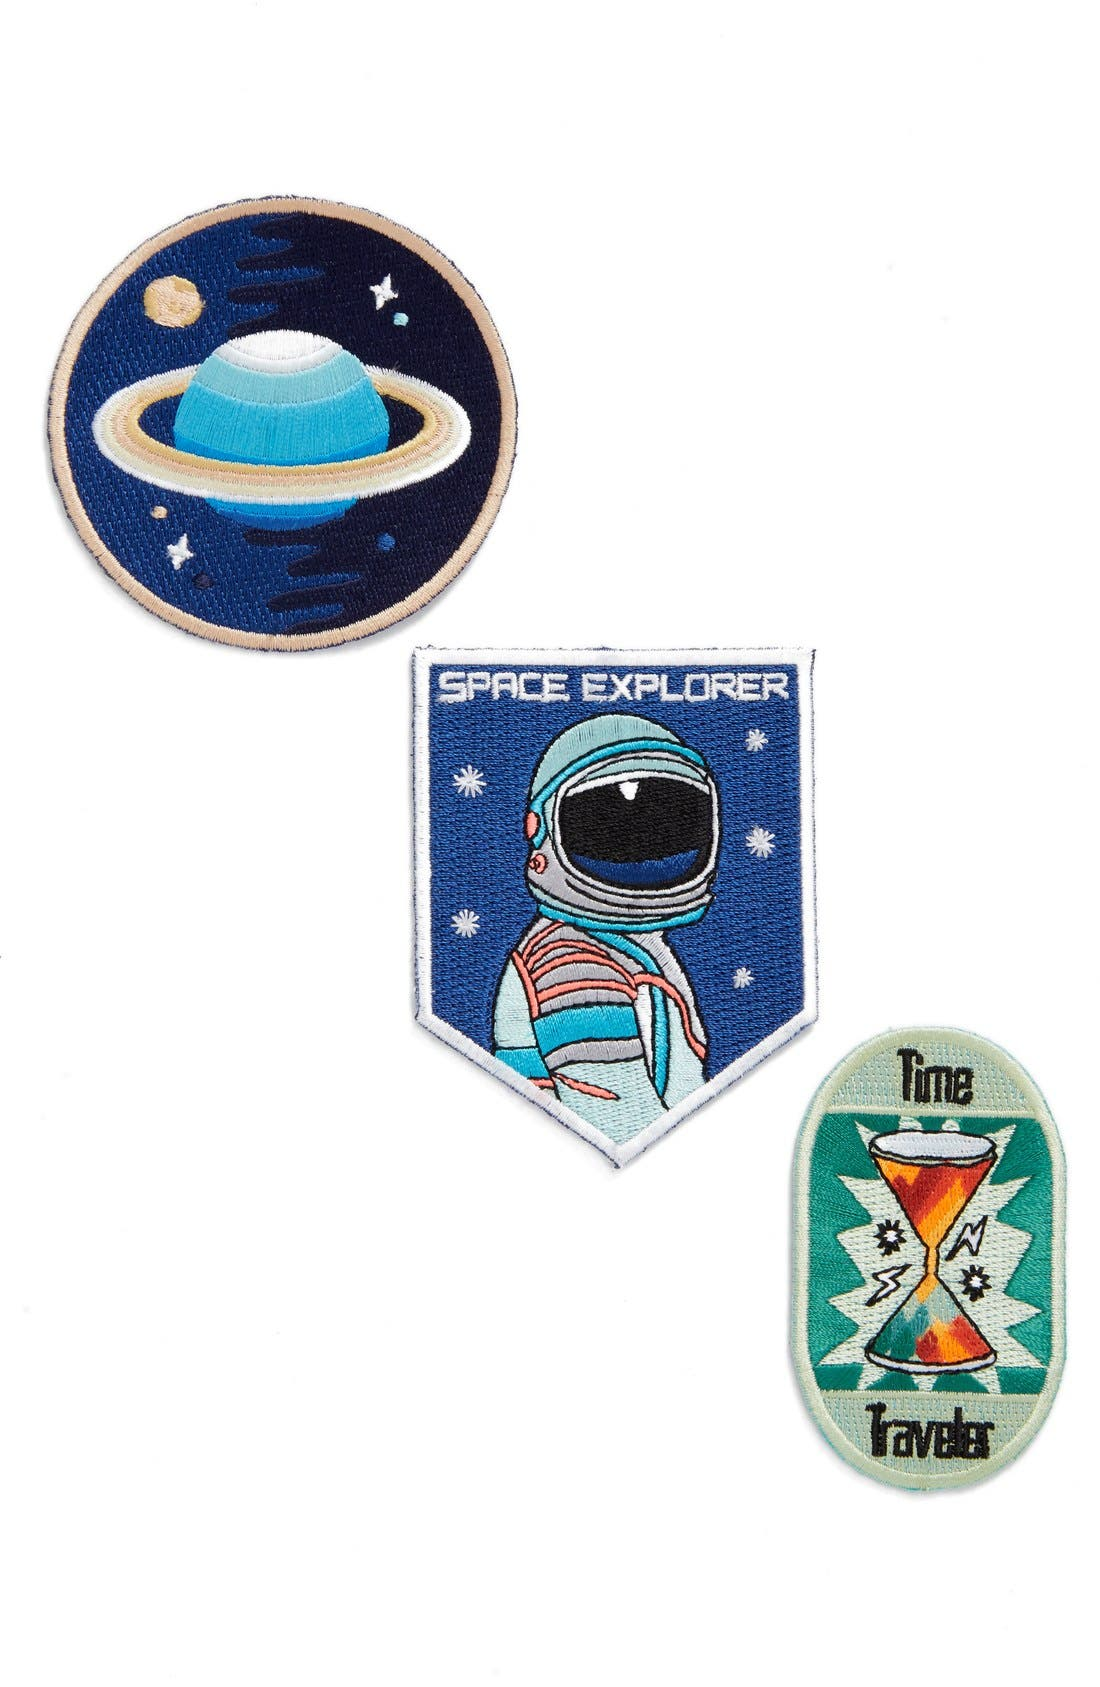 Alternate Image 1 Selected - Mokuyobi 'Space Traveler' Iron-On Patches (Set of 3)